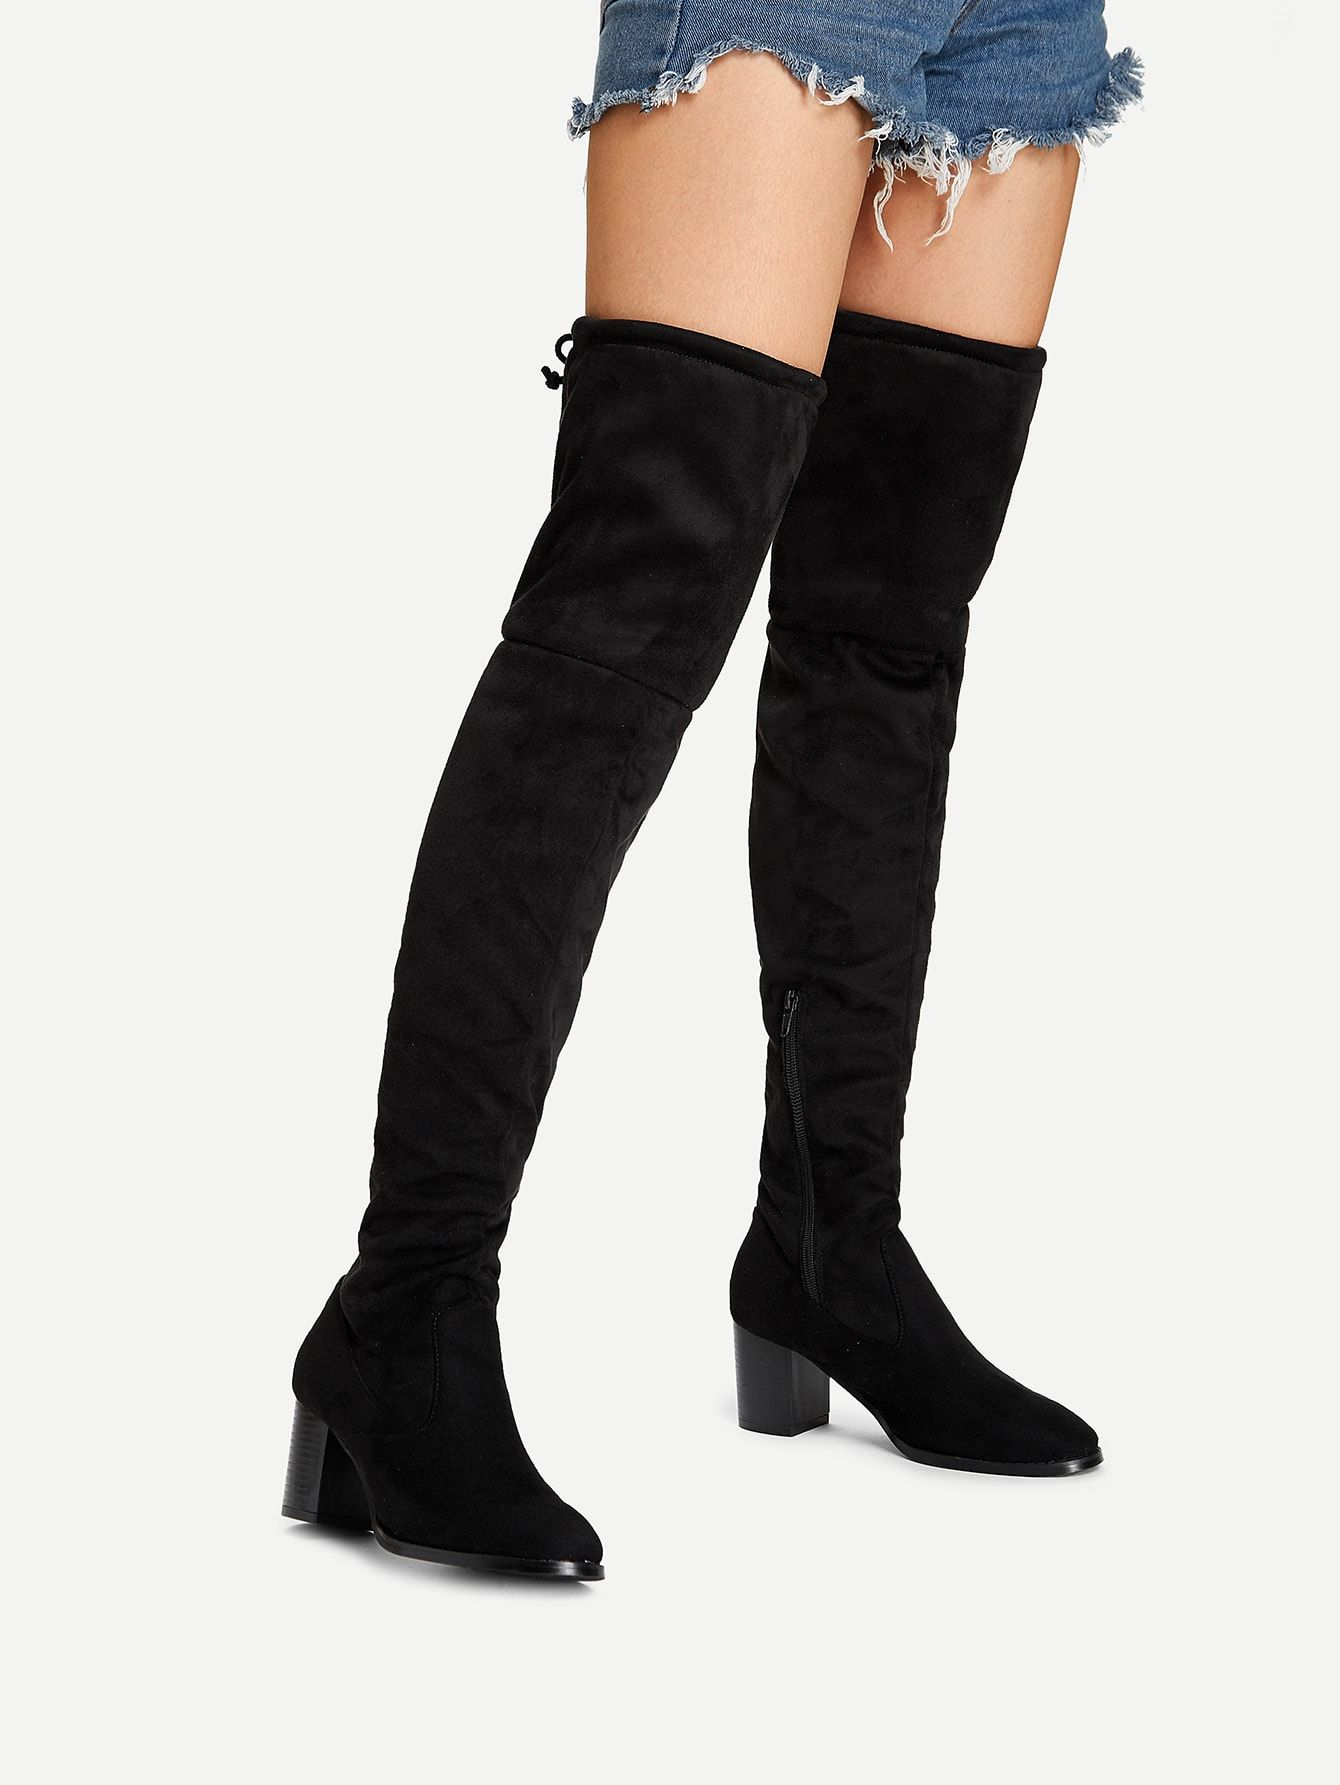 c7060ecc866 Casual Almond Toe OTK/Thigh High No zipper Black Chunky Over The ...